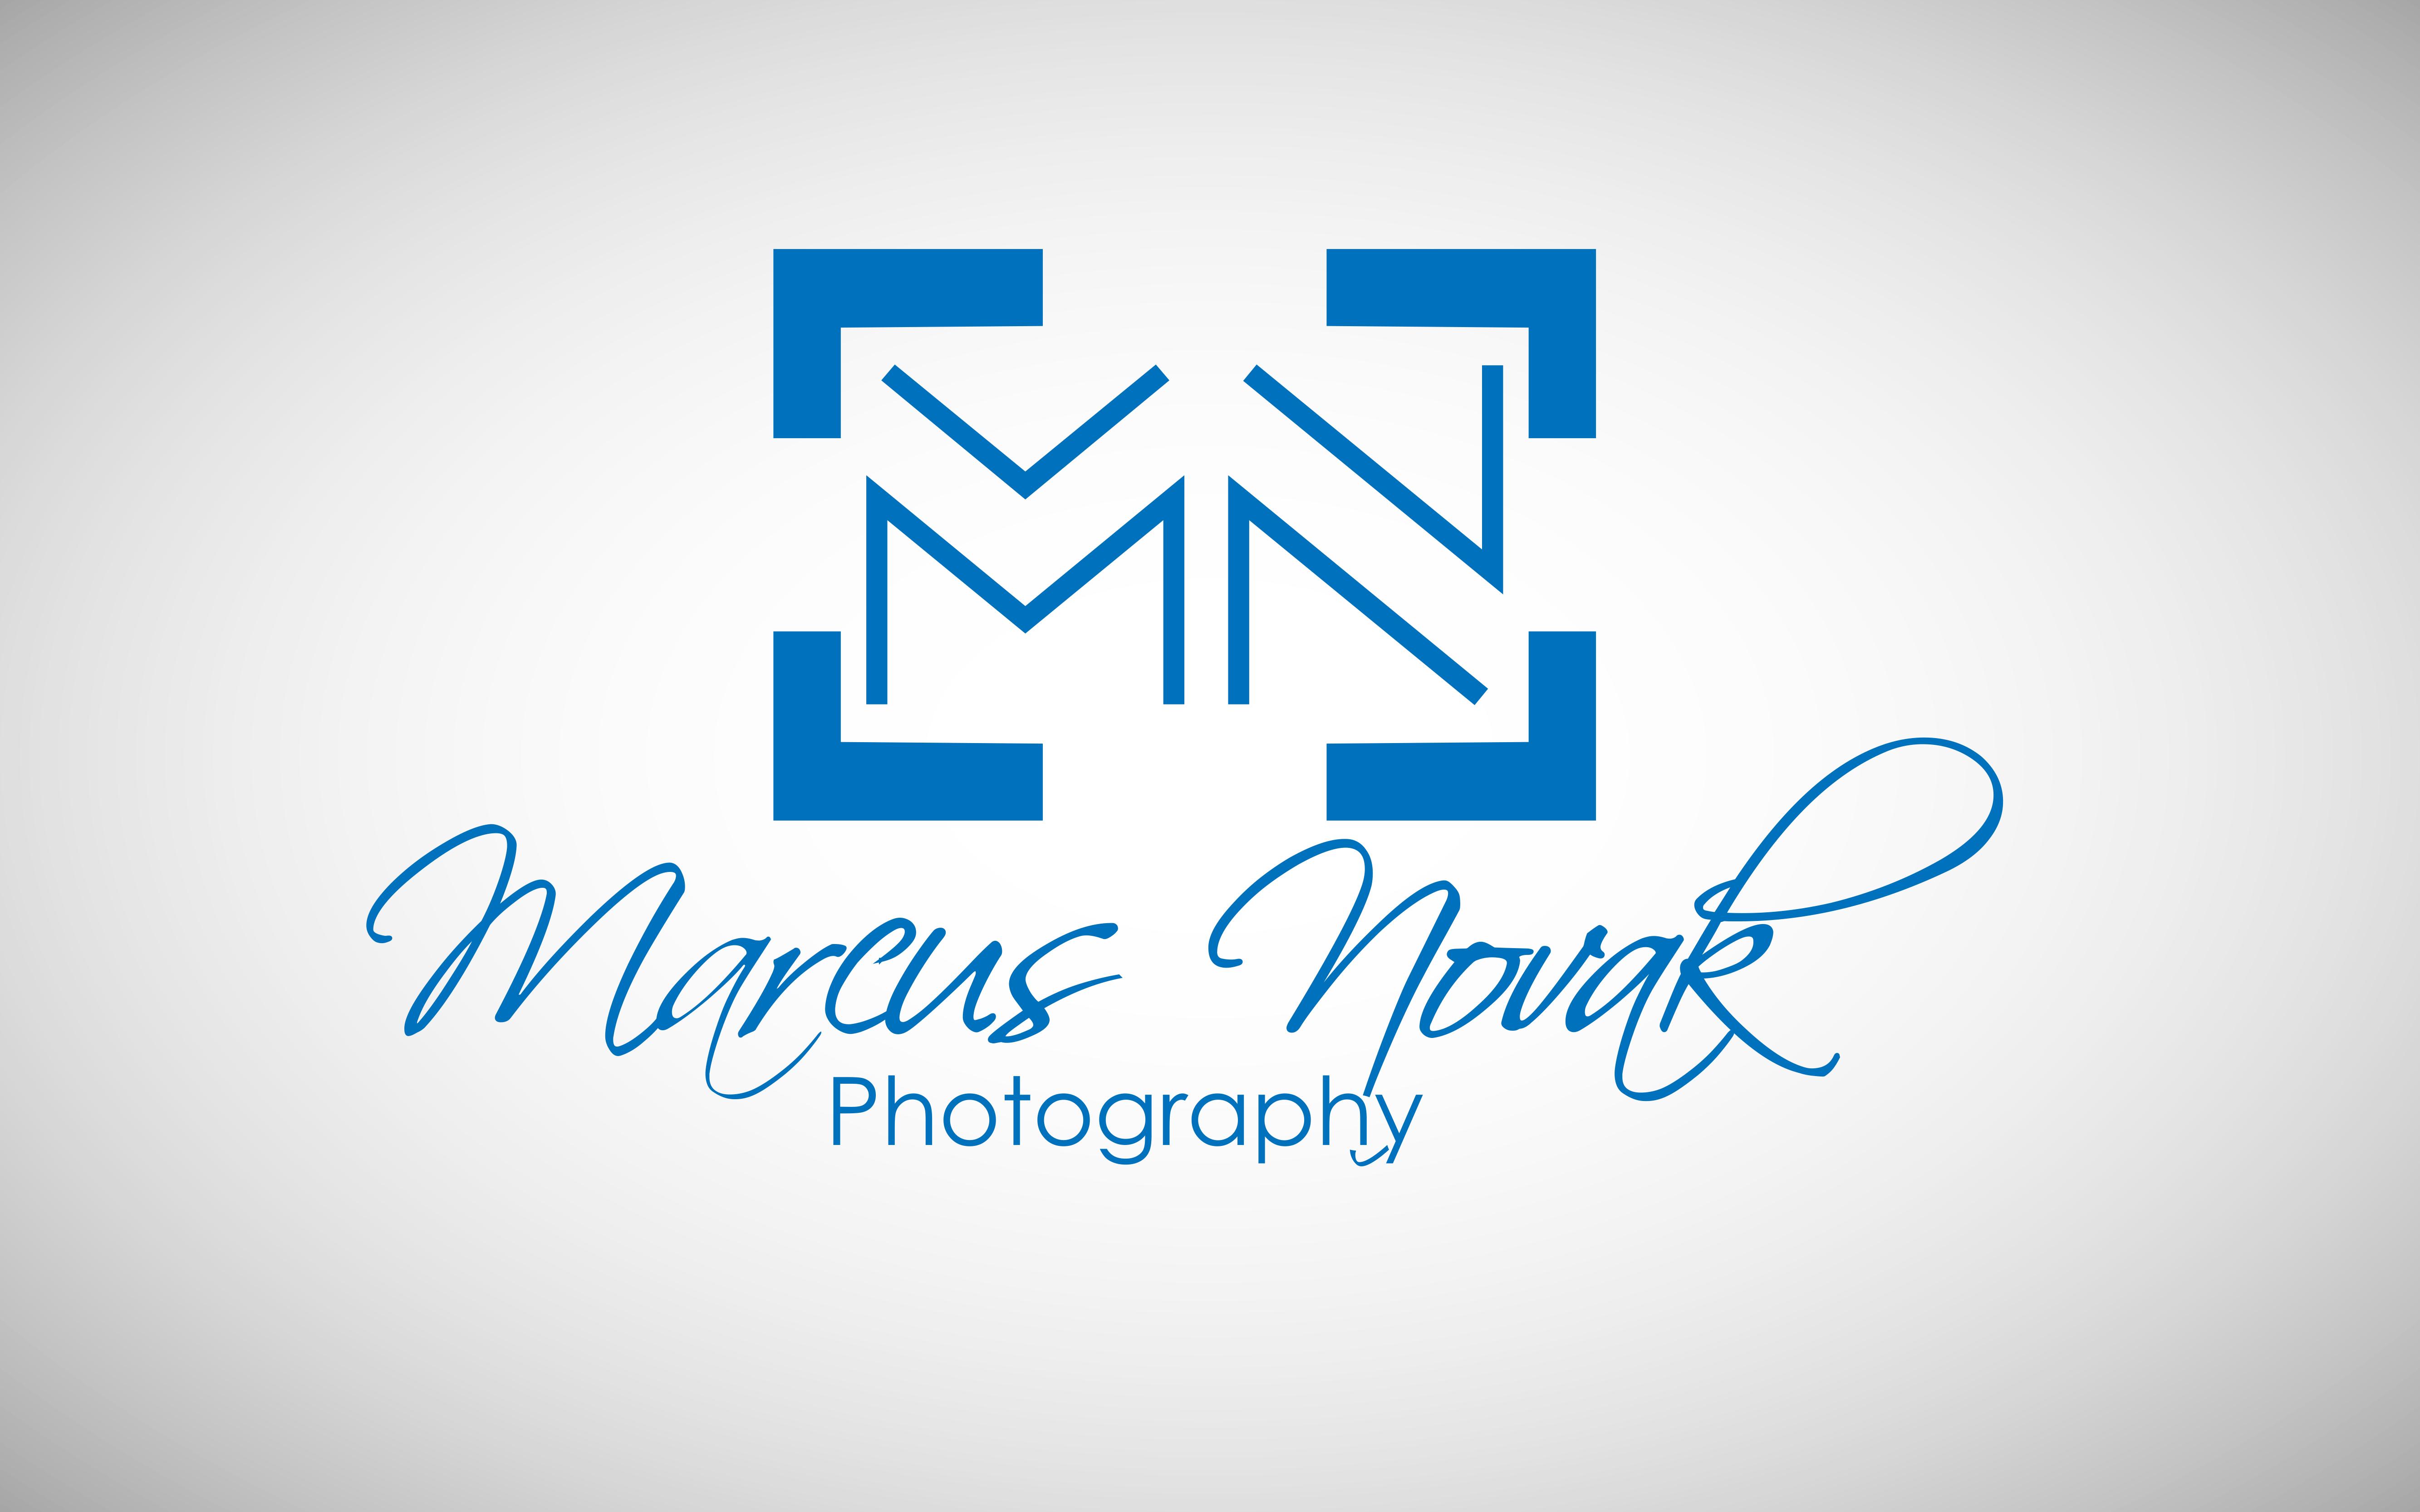 Marcus Novak Photography